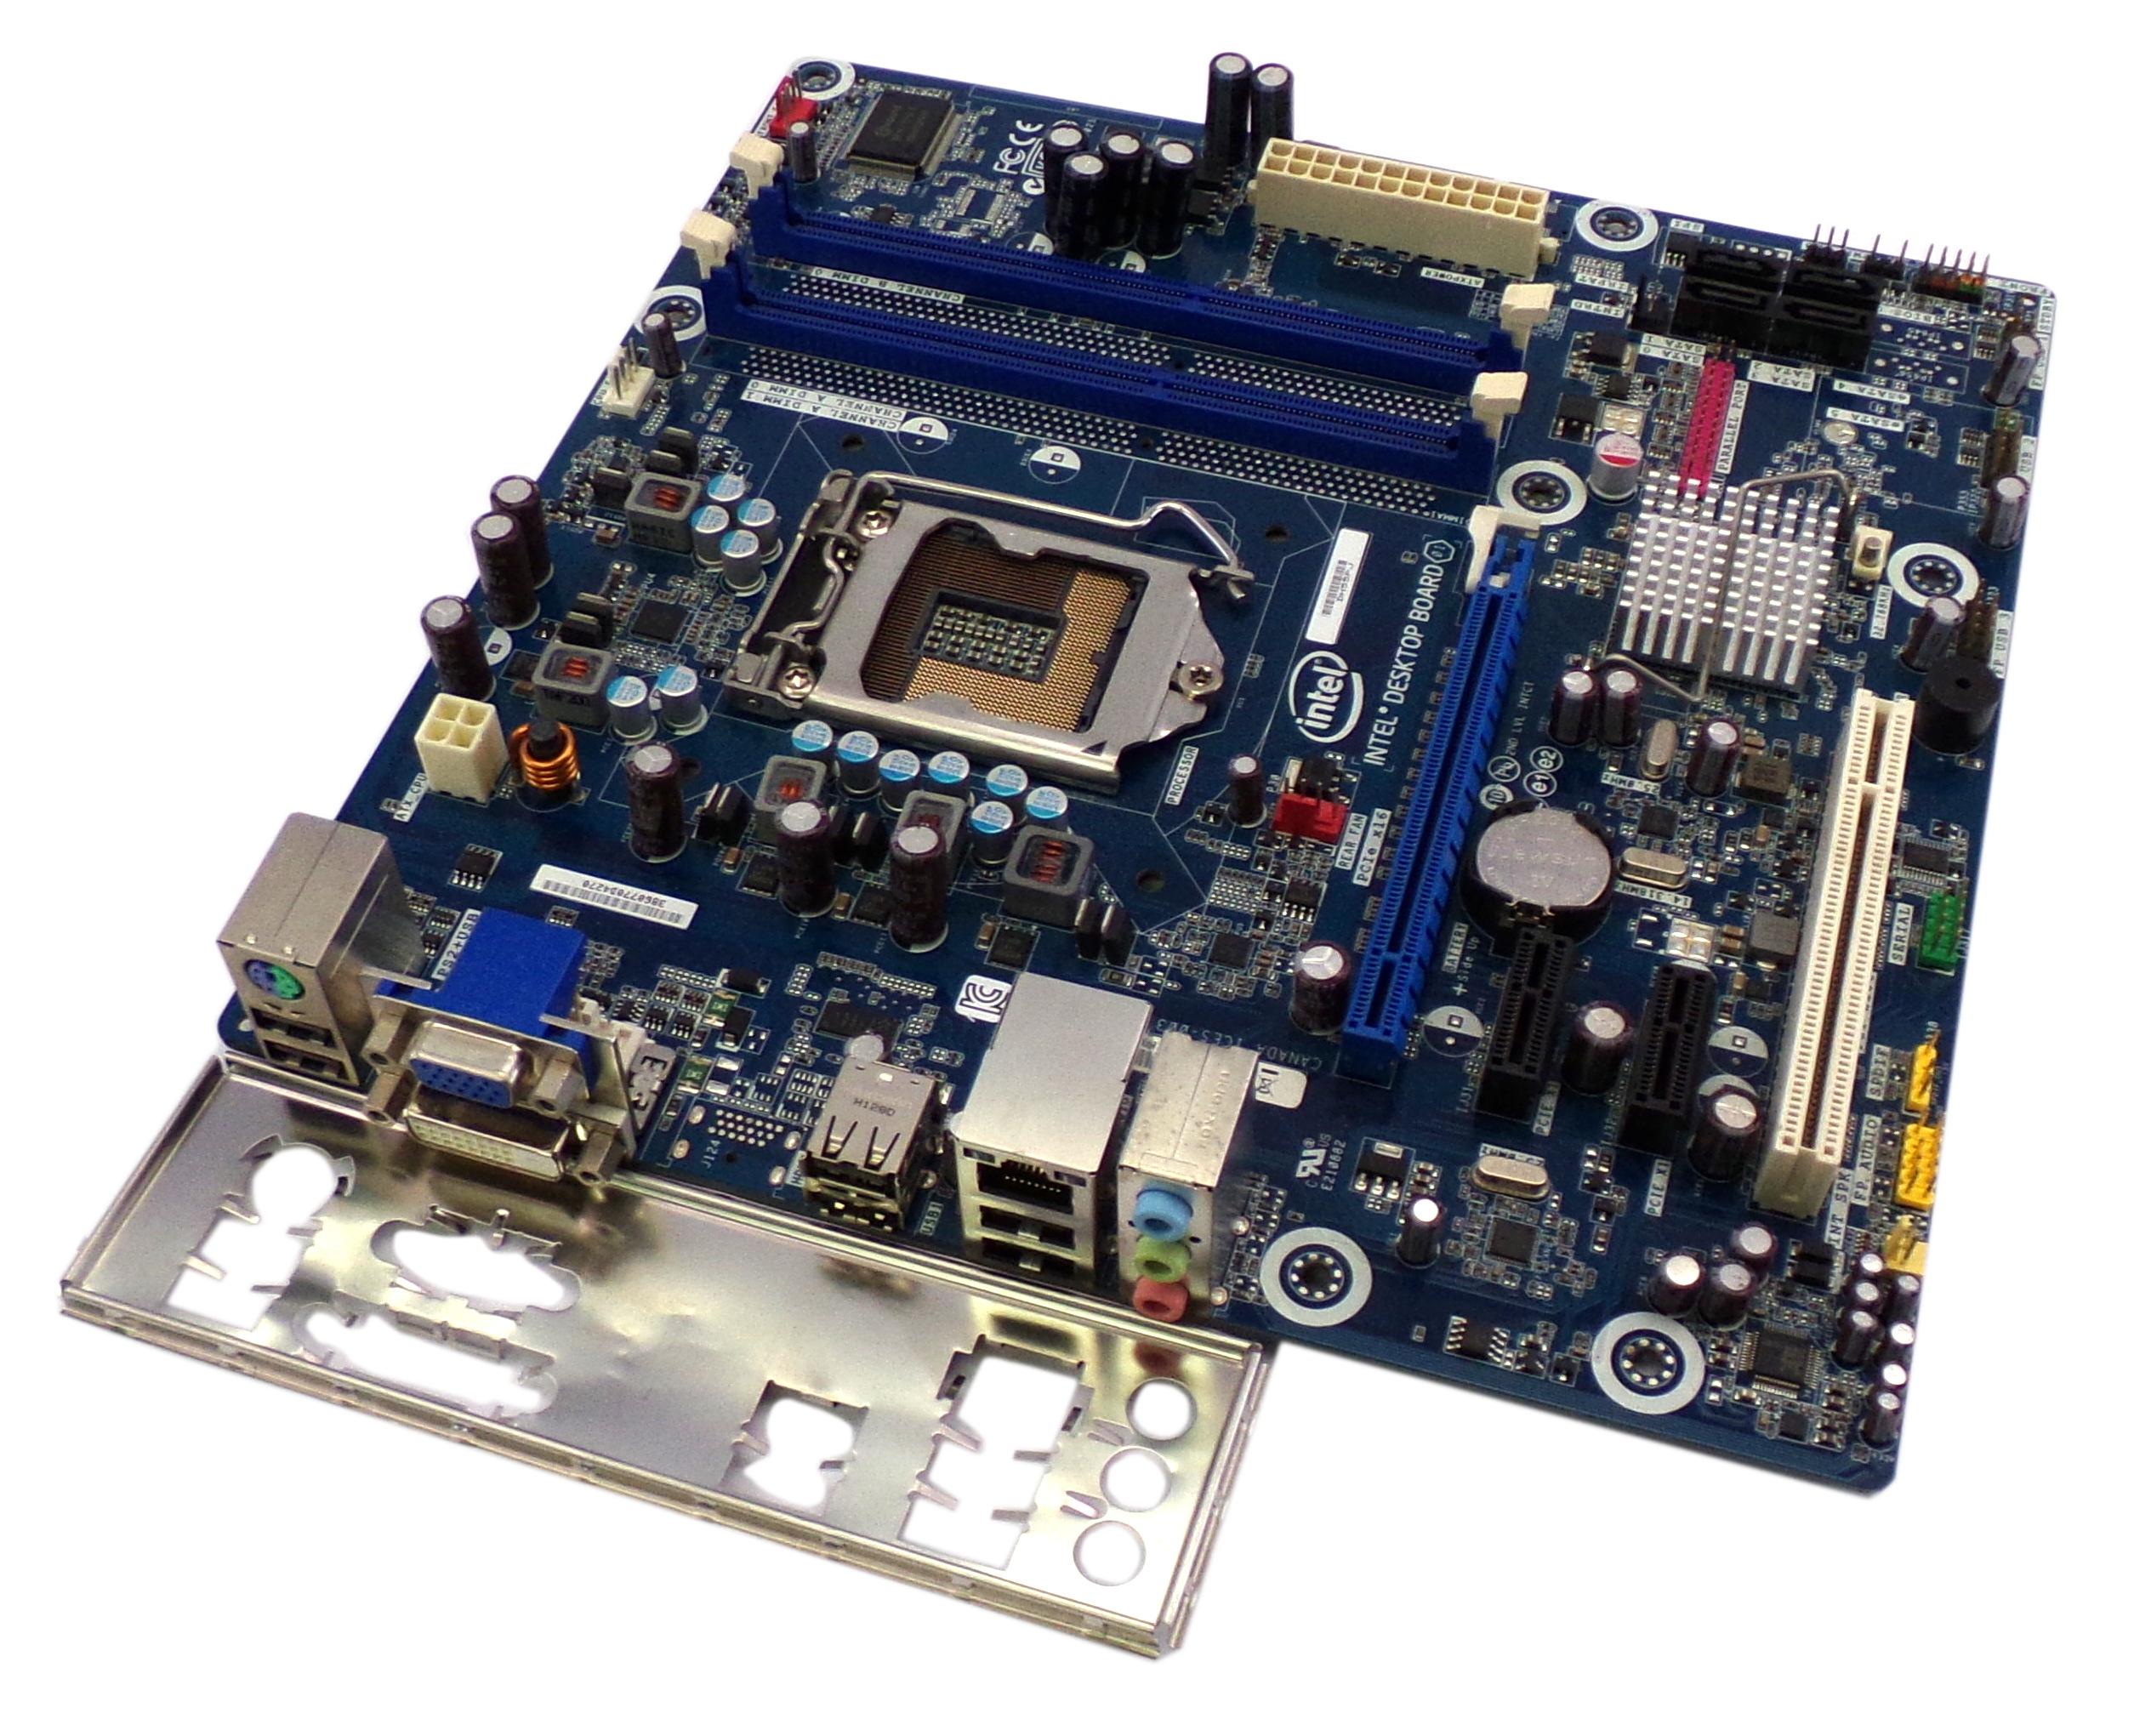 Intel E93812-303 DH55PJ DDR3 Socket LGA1156 Desktop Motherboard